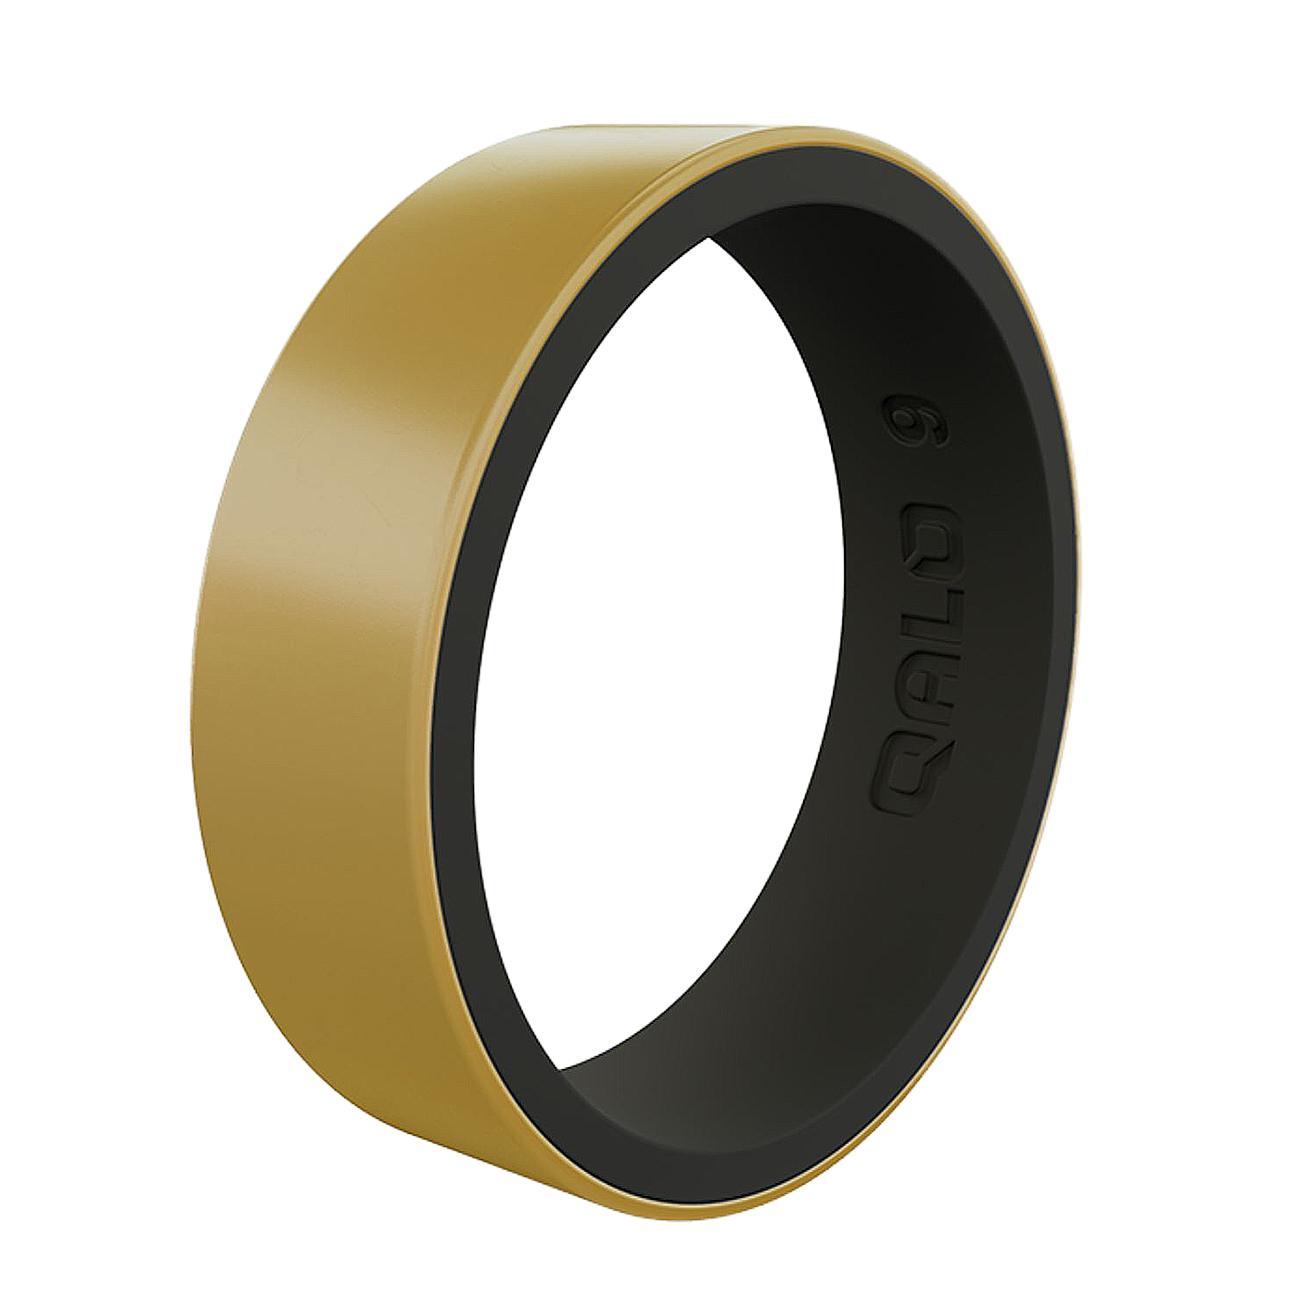 CRJ-180503-qualorings-_0005_womens-strata-metallic-gold-and-black-silicone-ring